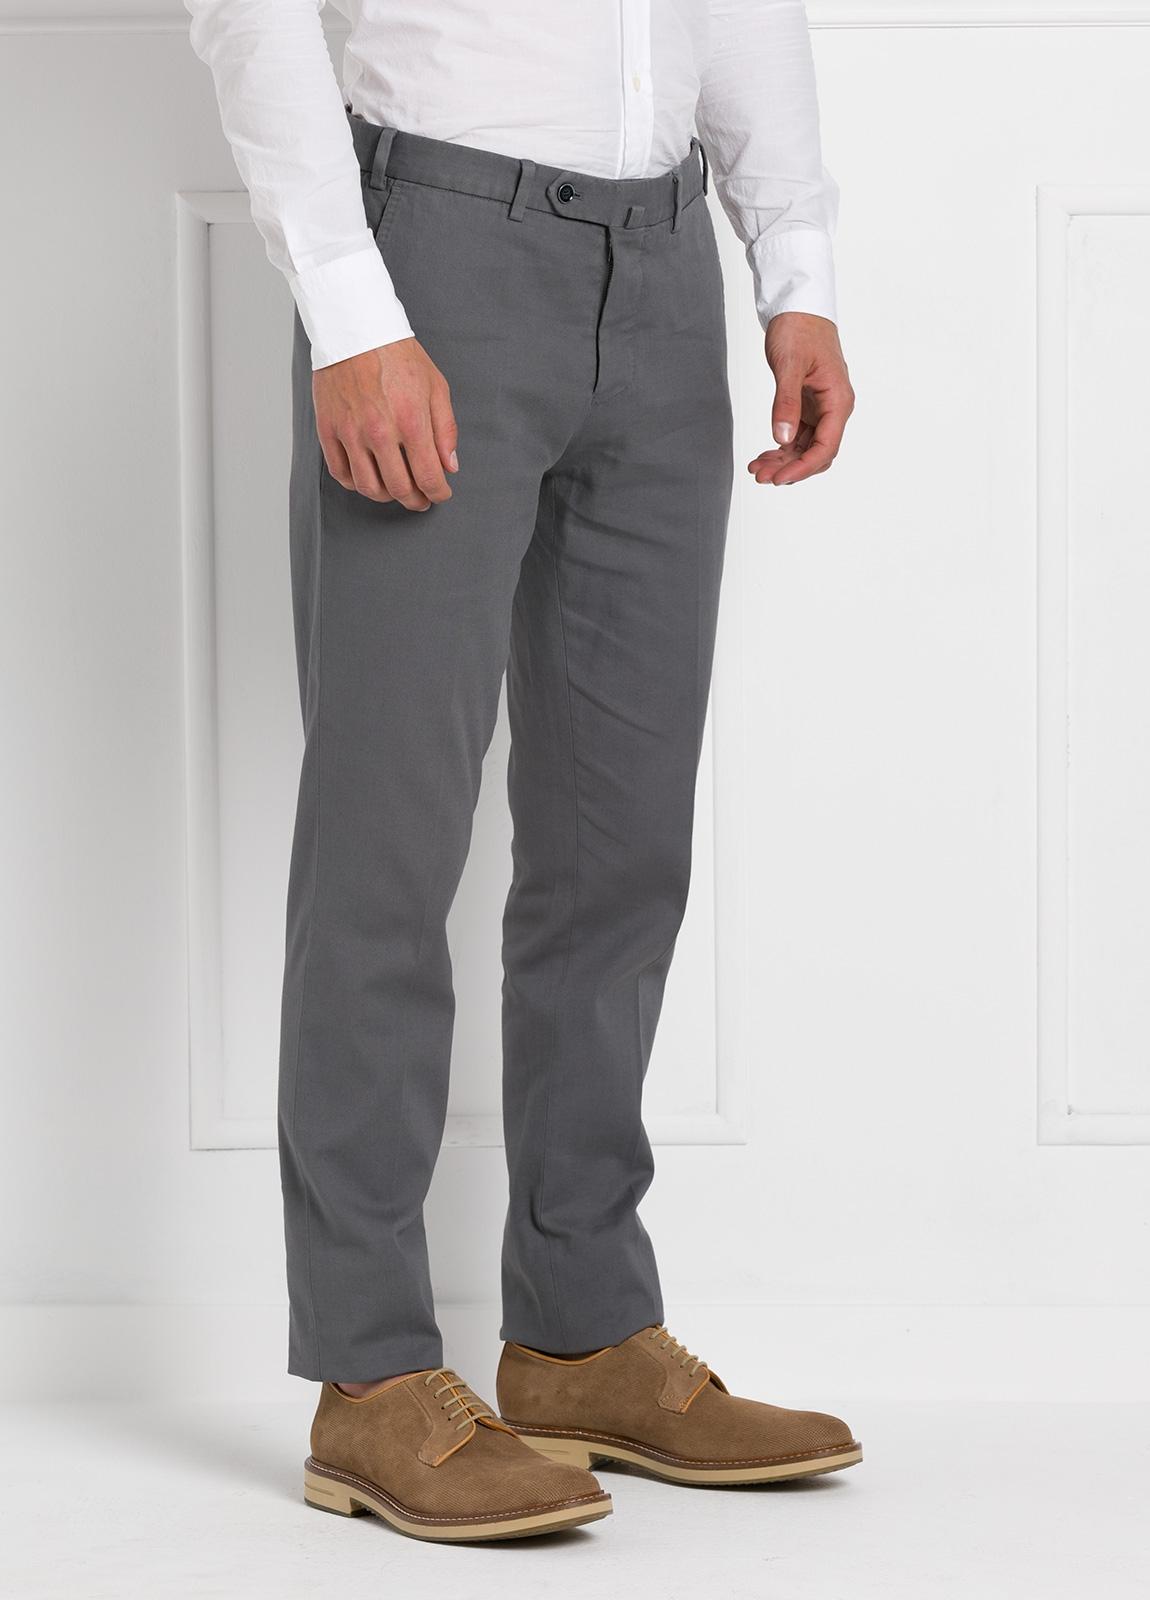 Pantalón chino modelo SANTA color gris. 97% Algodón 3% Elastán. - Ítem3